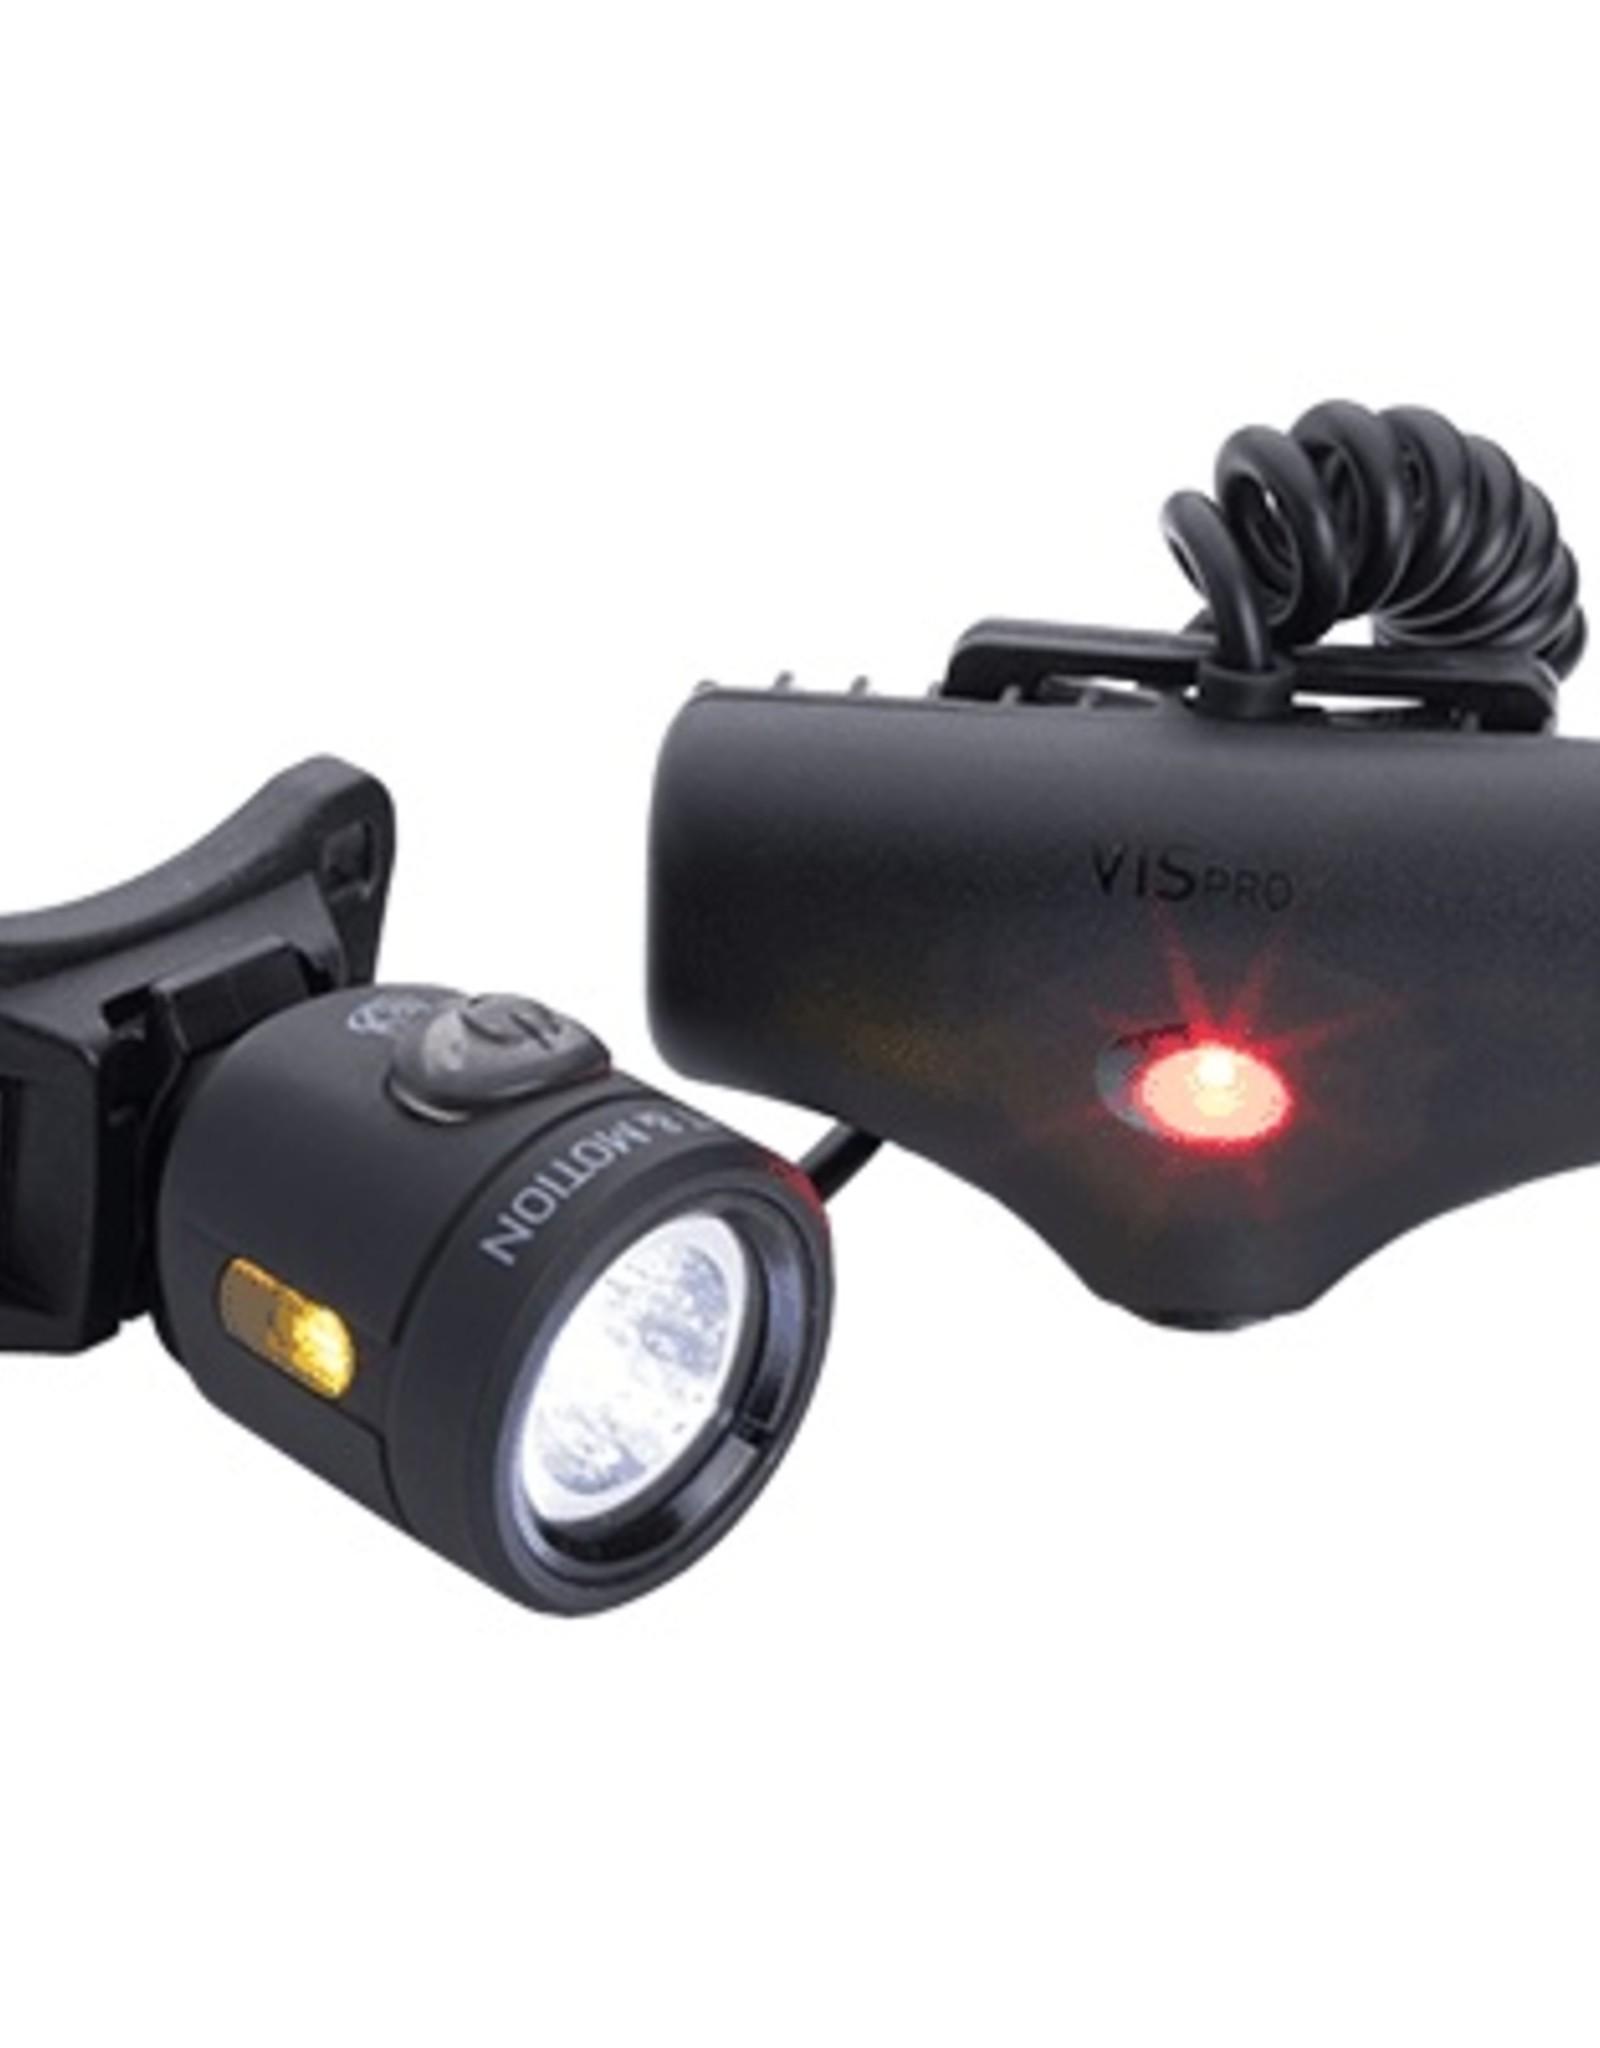 Light - Helmet Light - Light and Motion Vis Pro 600 Lumens